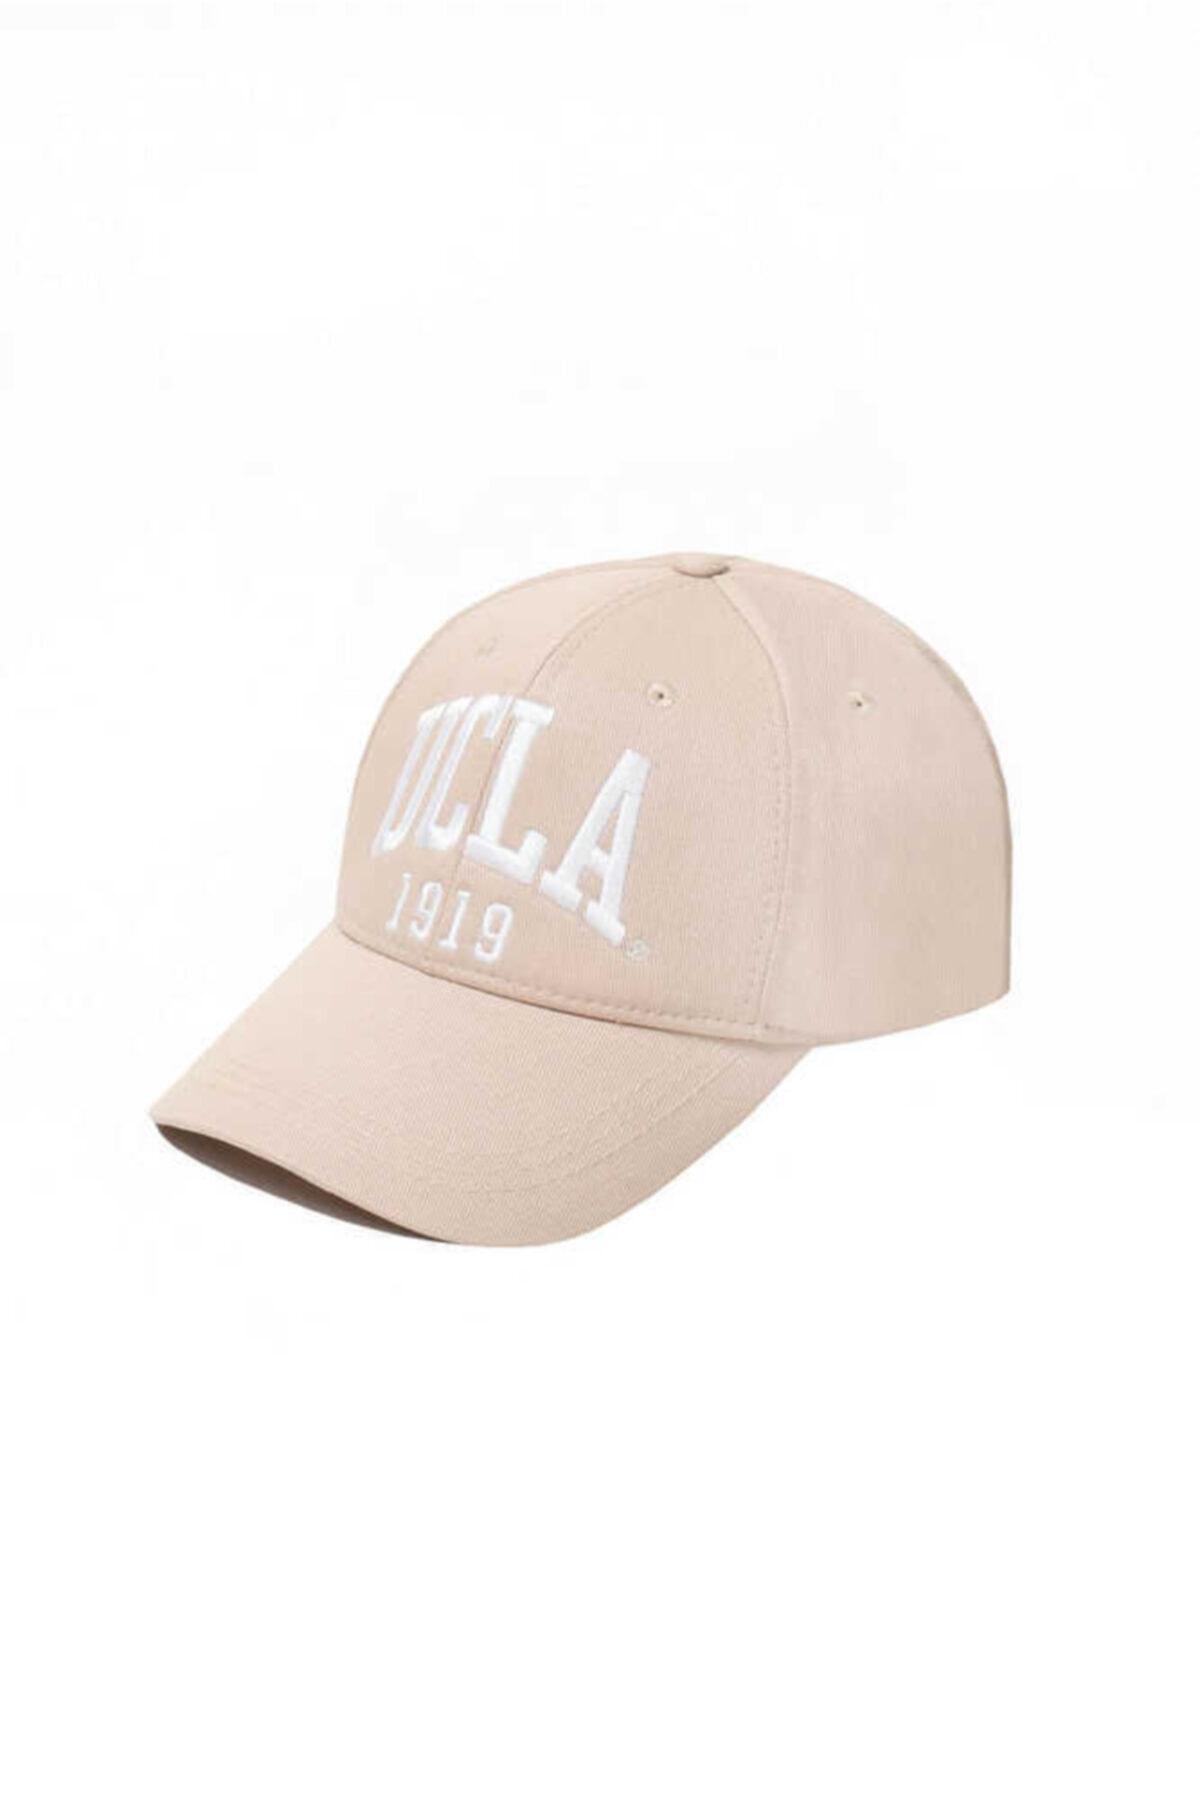 Ballard Bej Baseball Cap Nakışlı Şapka